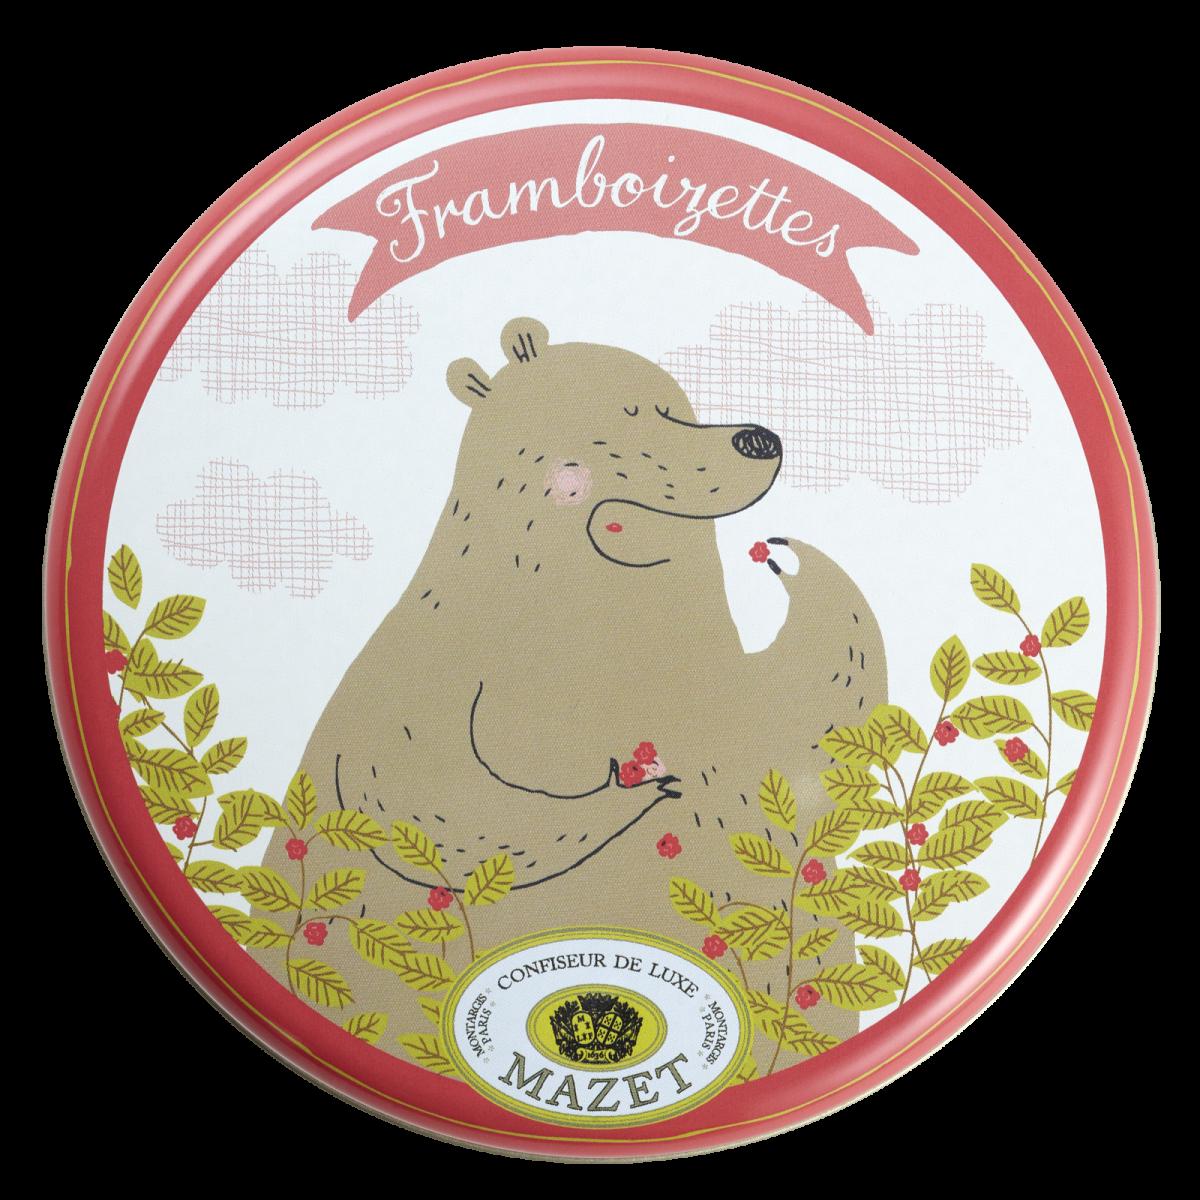 Framboizettes - Boite ours, Framboizettes 65g